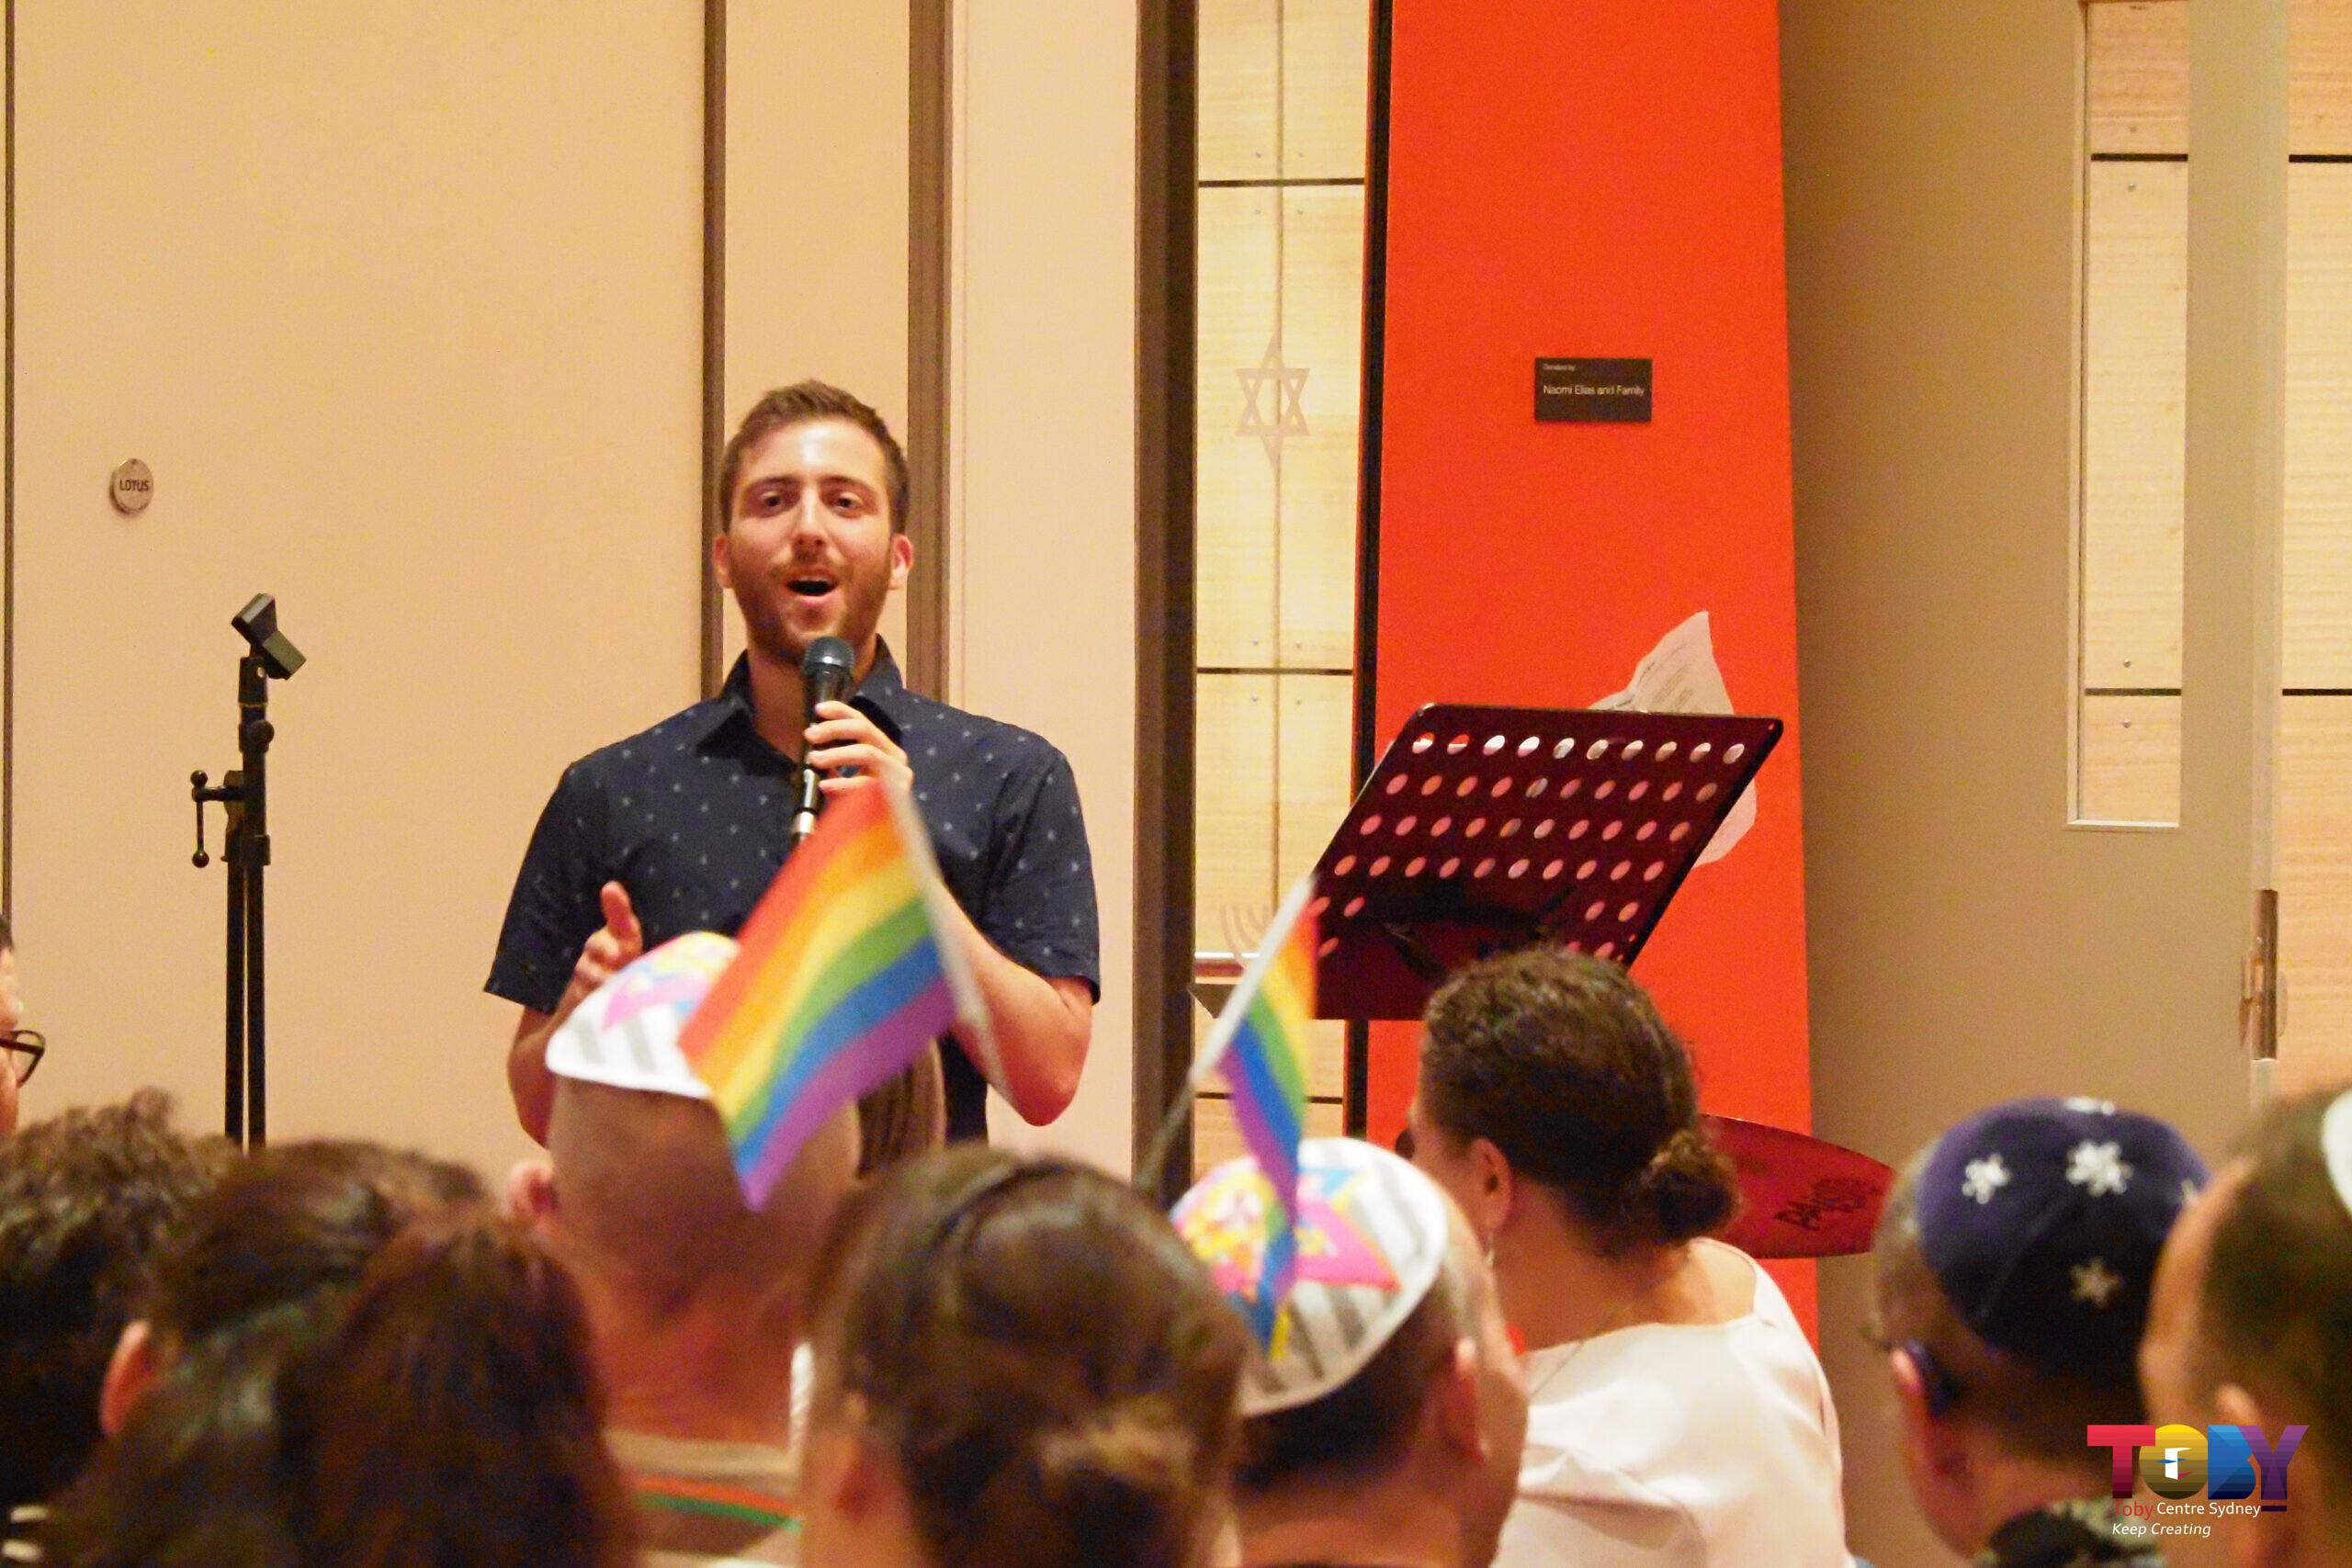 Jarod Rhine-Davis speaking at last year's Pride Shabbat event at Sydney's Emanuel Synagogue on Mardi Gras eve.